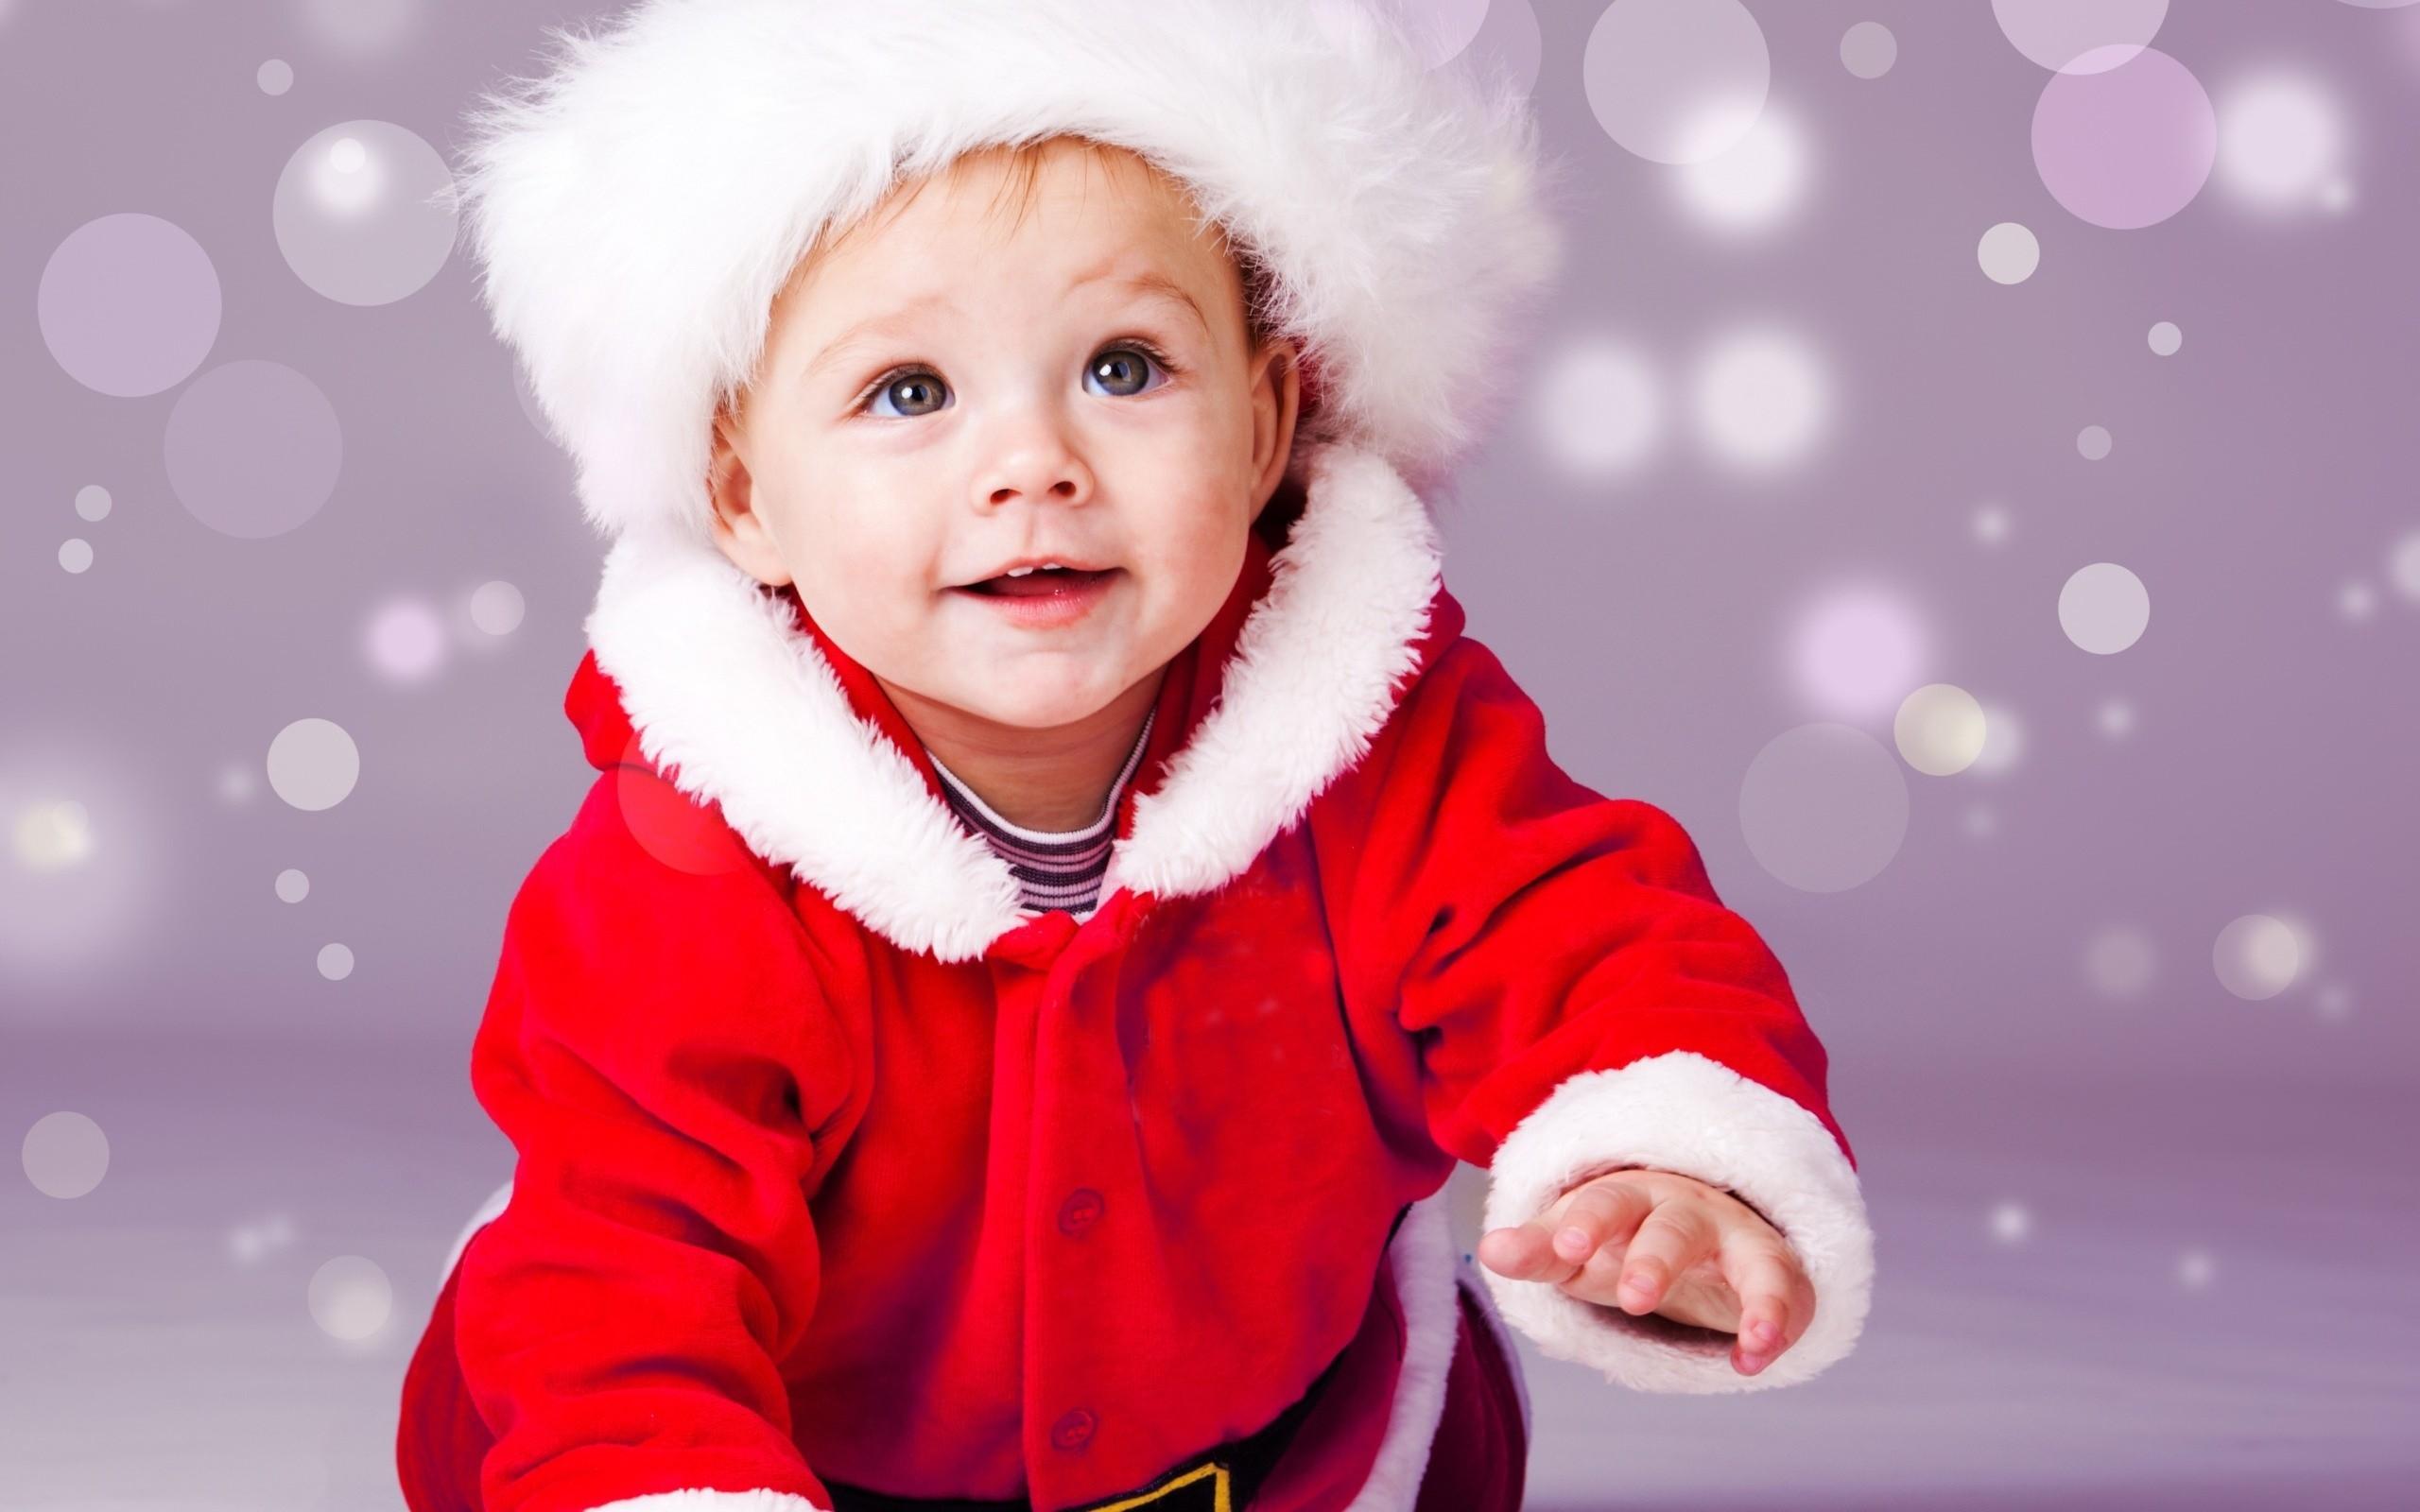 Res: 2560x1600, Christmast Baby Wallpaper Wallpaper